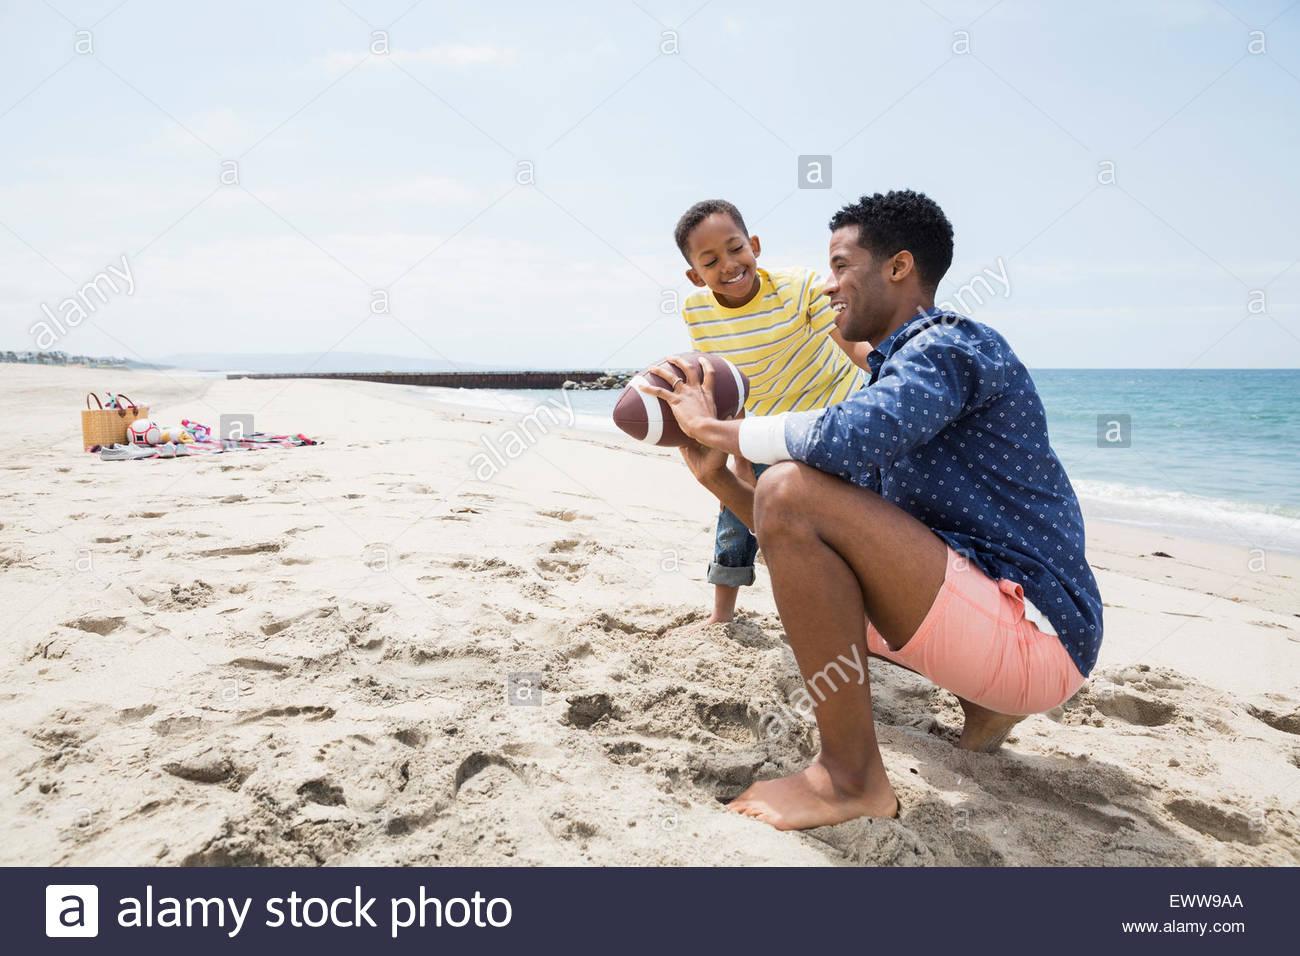 Father teaching son football grip on beach - Stock Image